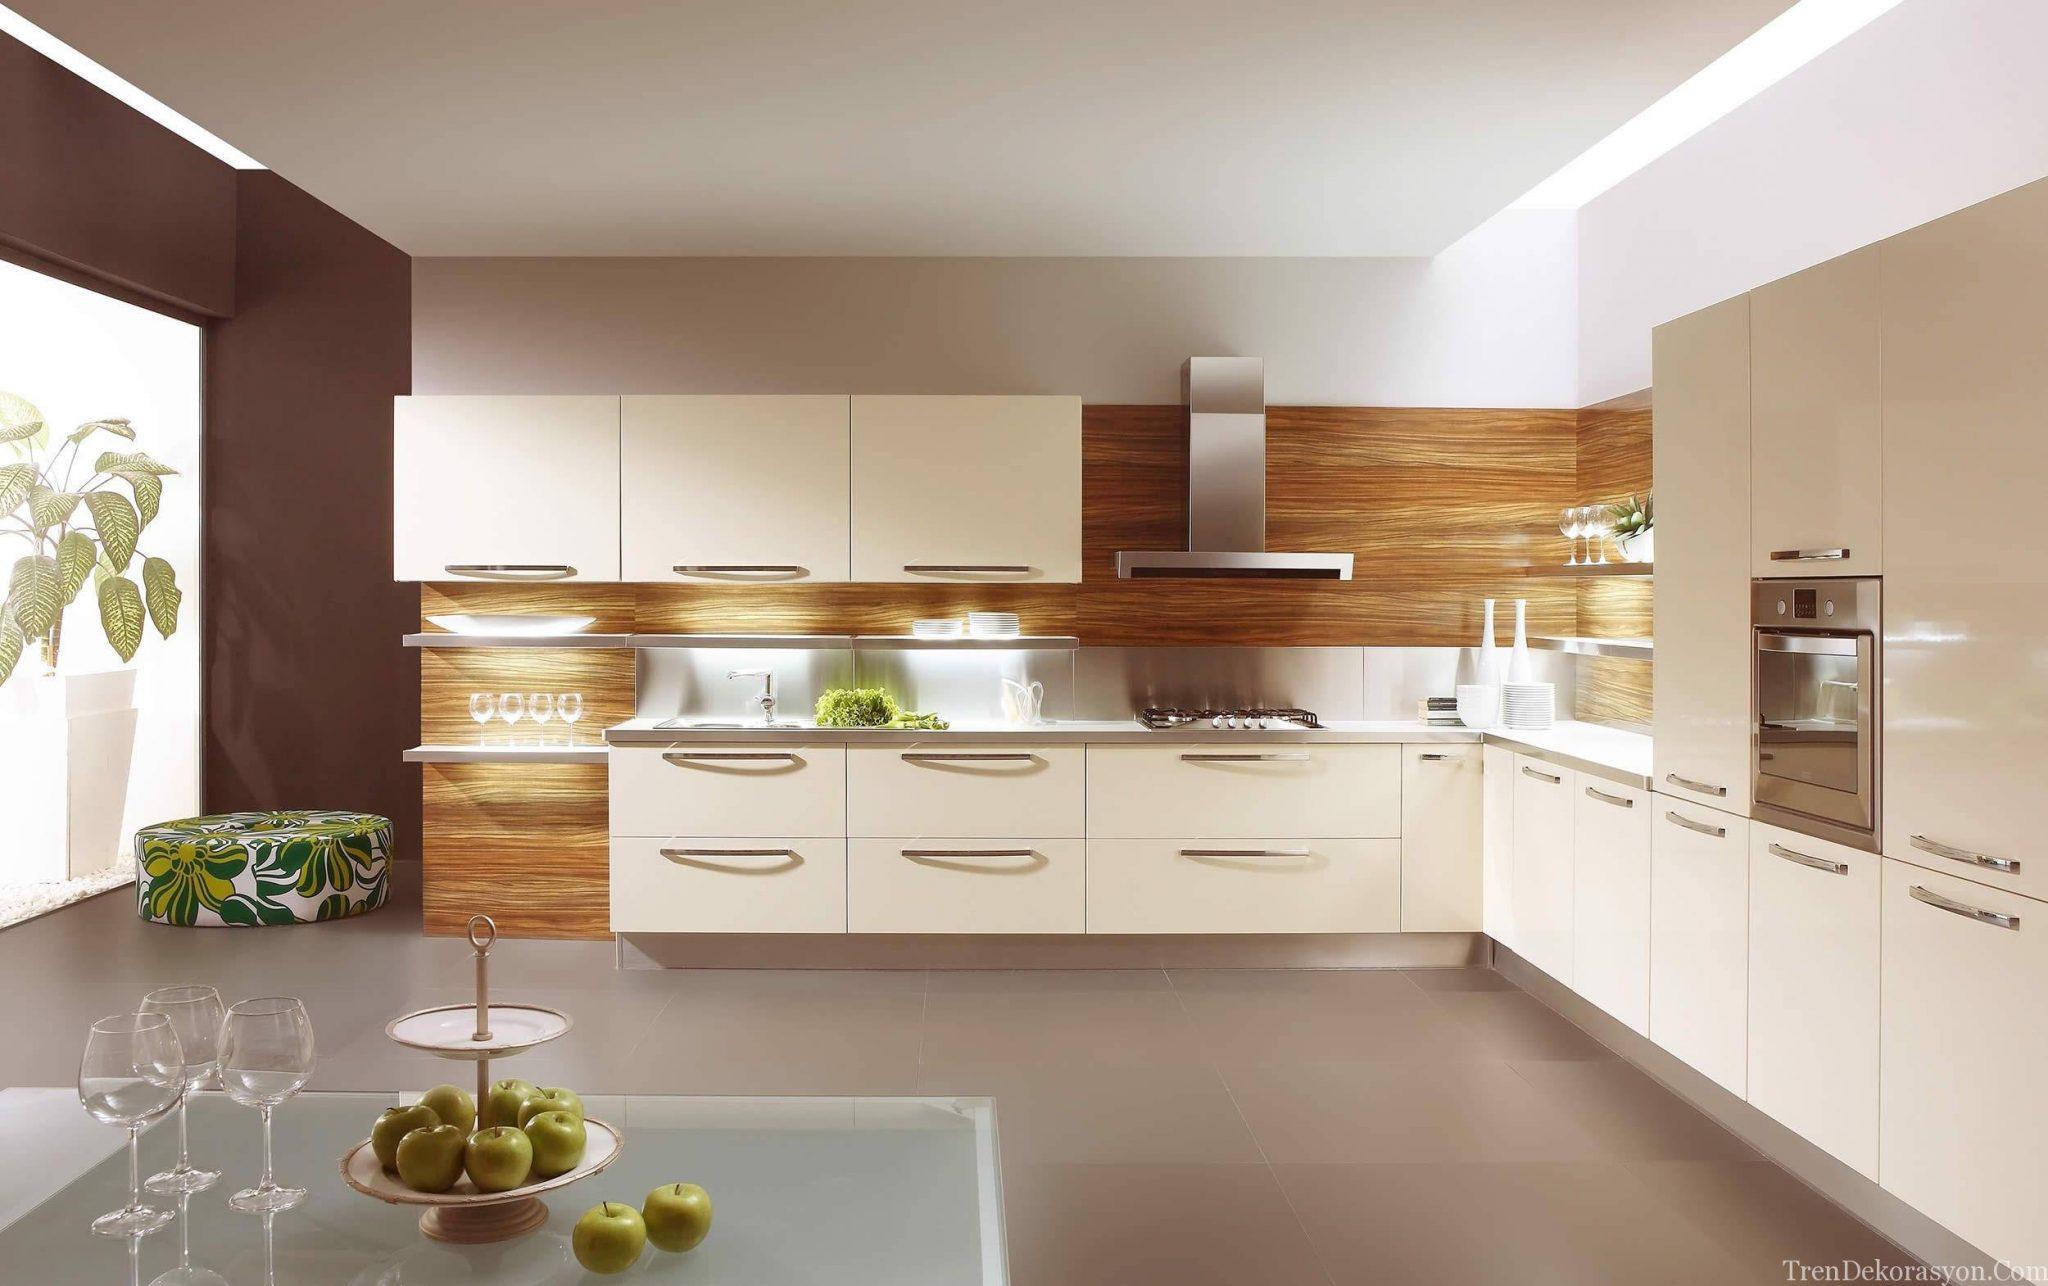 2017 y l nda en ok tercih edilen mutfak dolab modelleri. Black Bedroom Furniture Sets. Home Design Ideas